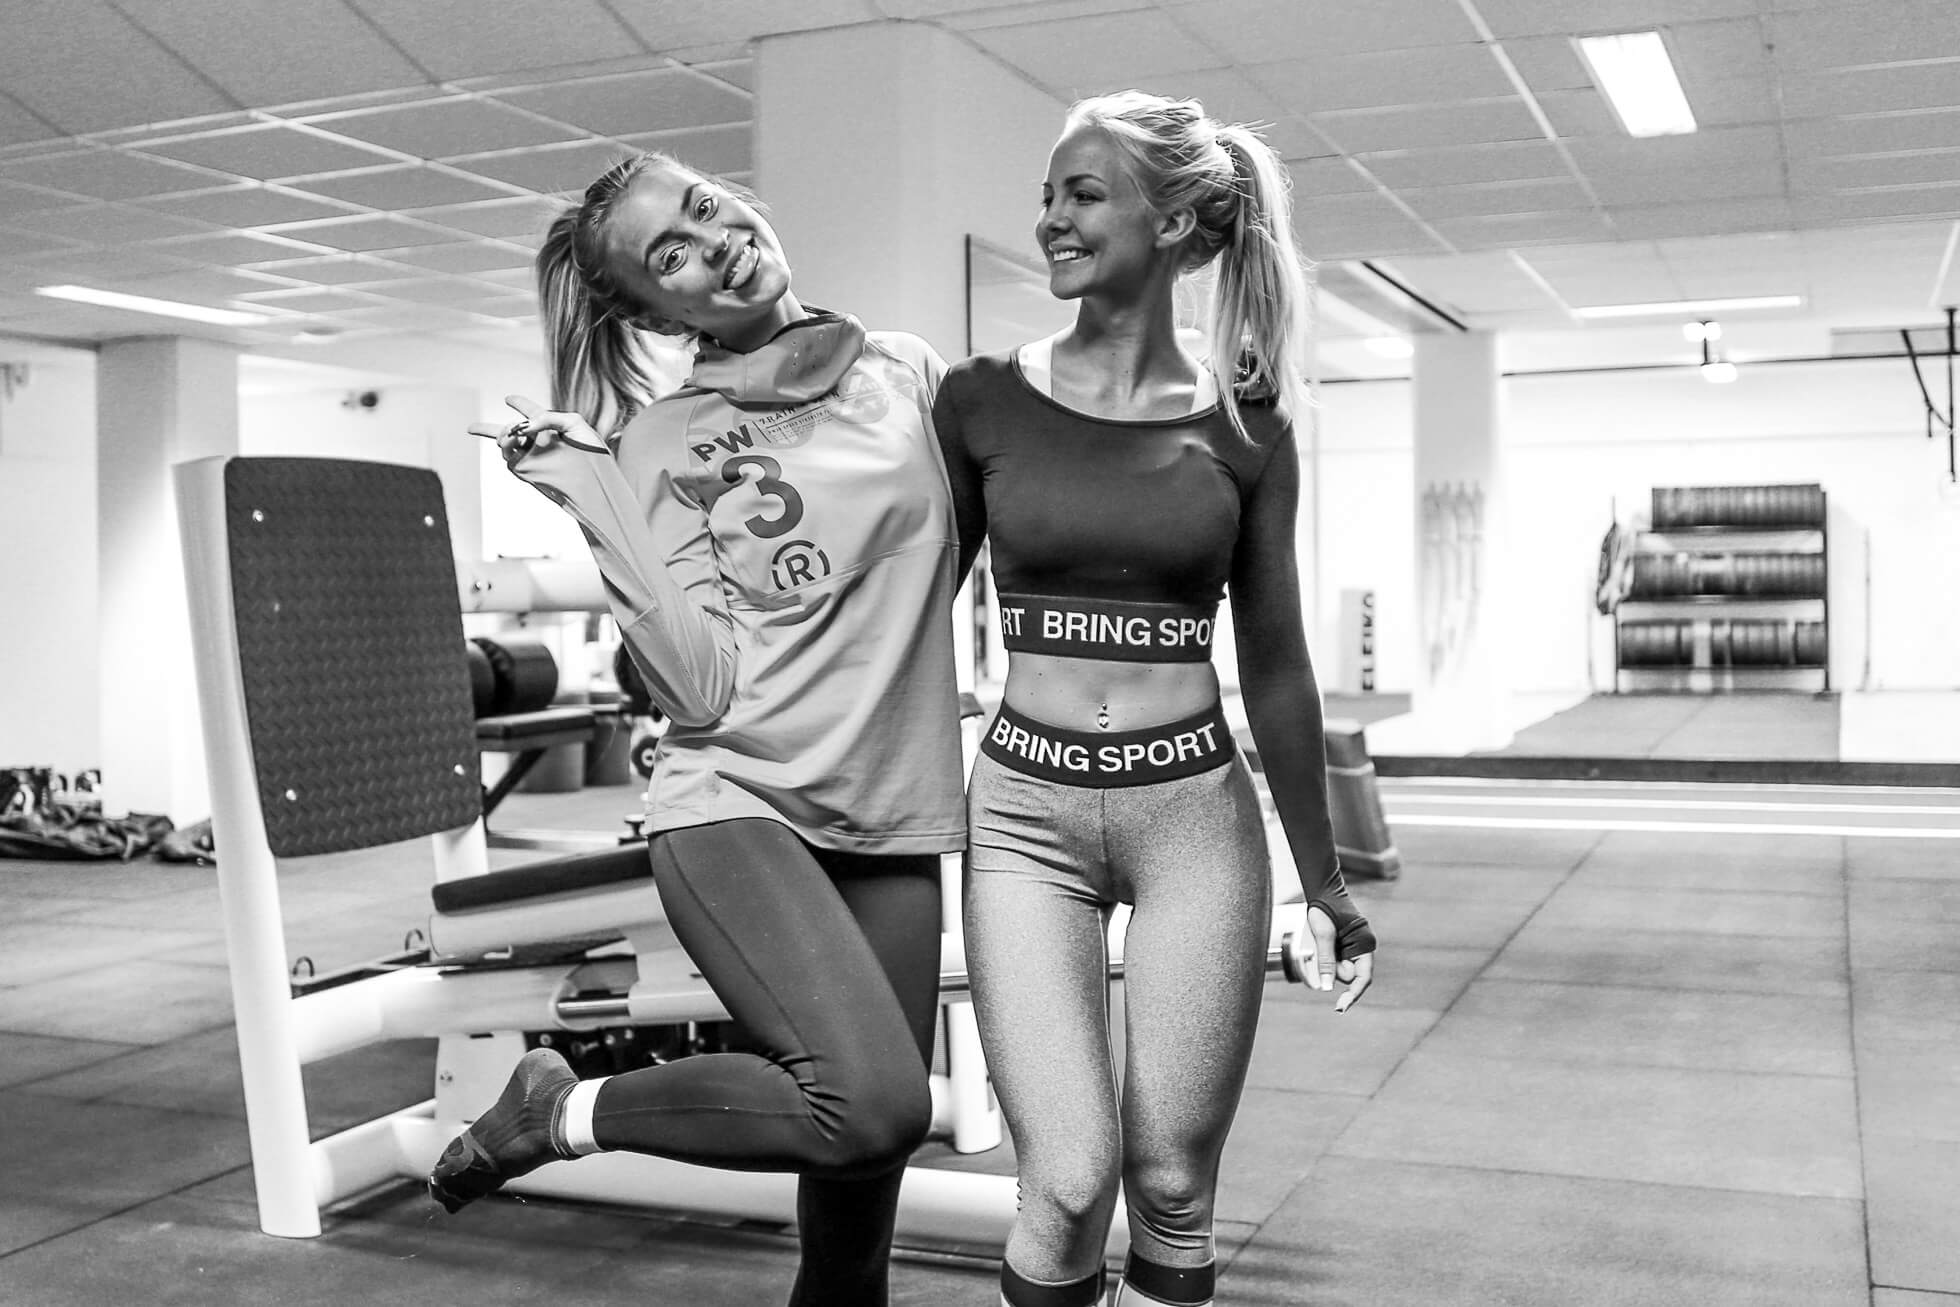 janni-deler-workout-buddyalexandra-bring-janni-deler-18